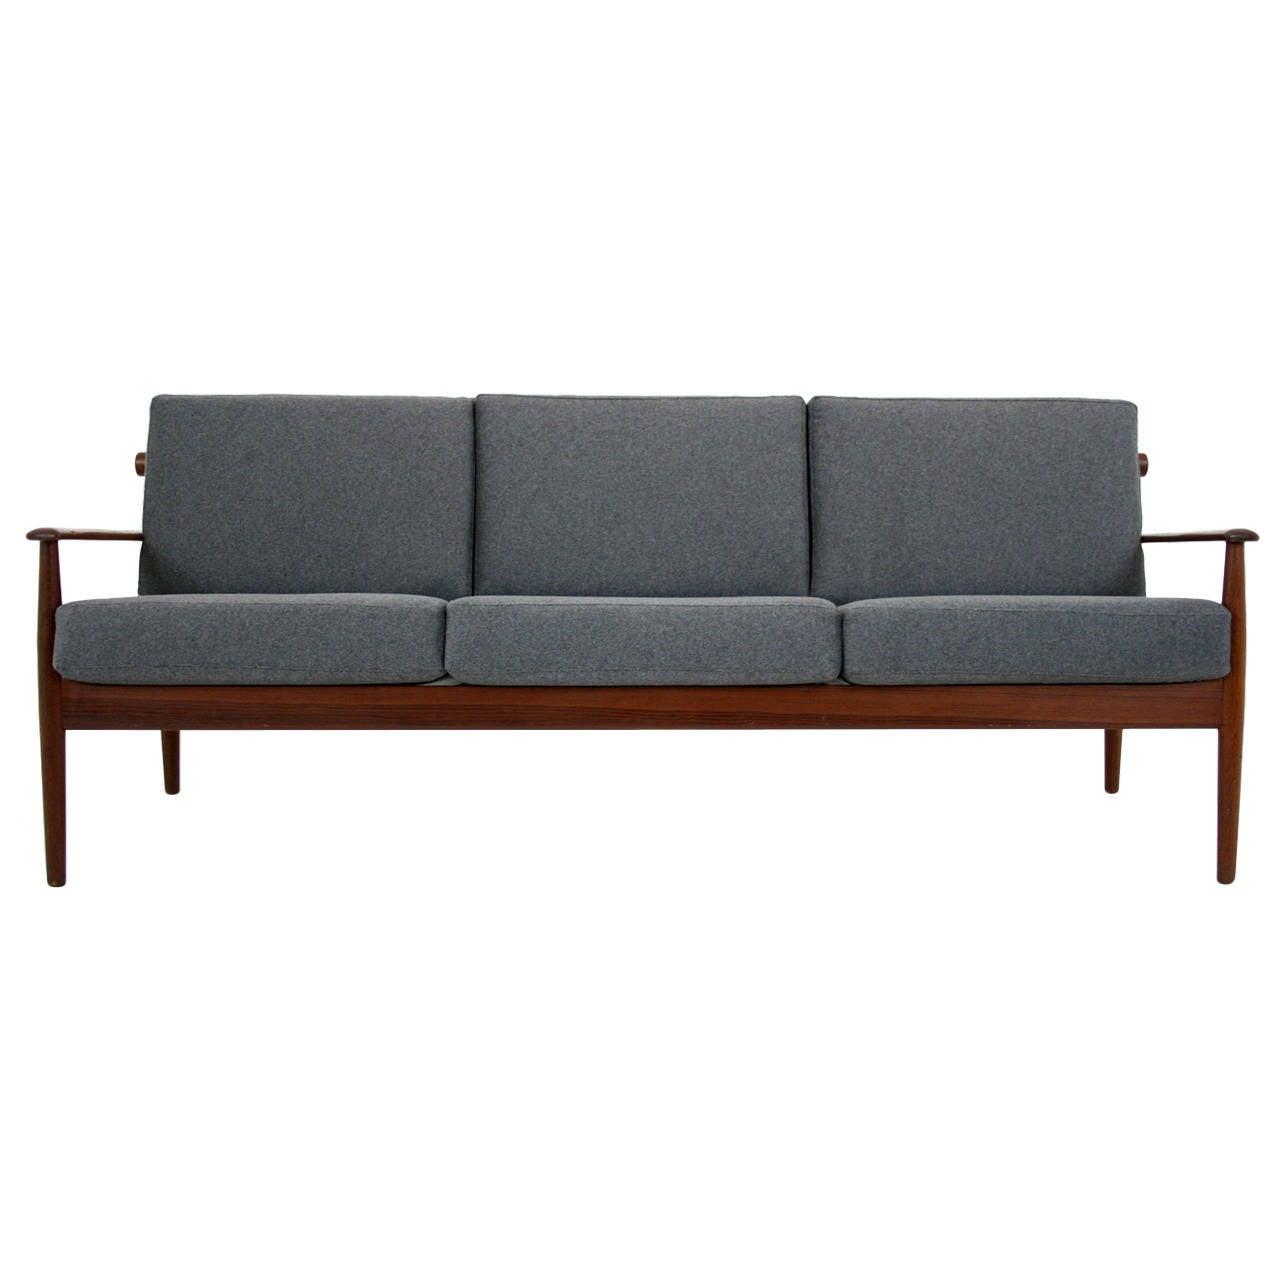 mid century style sofa canada dakota fantastic furniture danish modern stunning teak three seat or